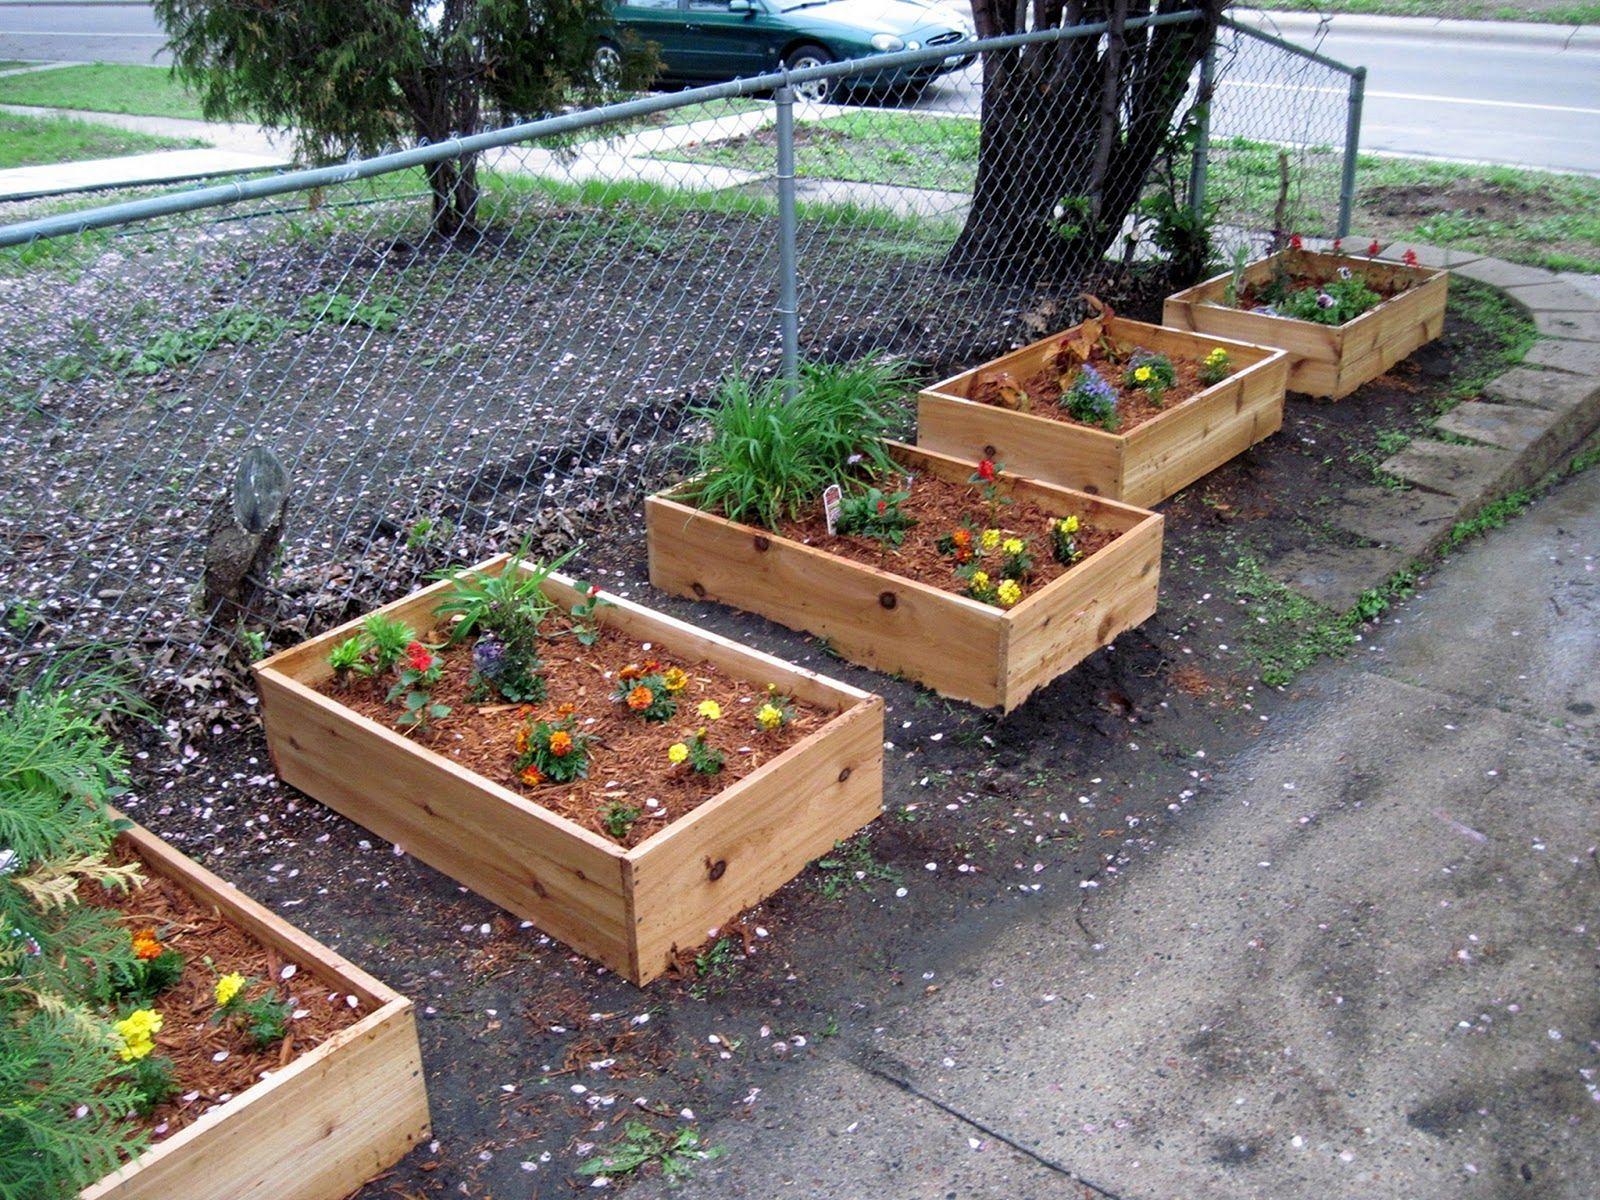 30 Easy Diy Wooden Planter Box Ideas For Beginners Freshouz Com Diy Wood Planter Box Diy Wooden Planters Diy Wood Planters